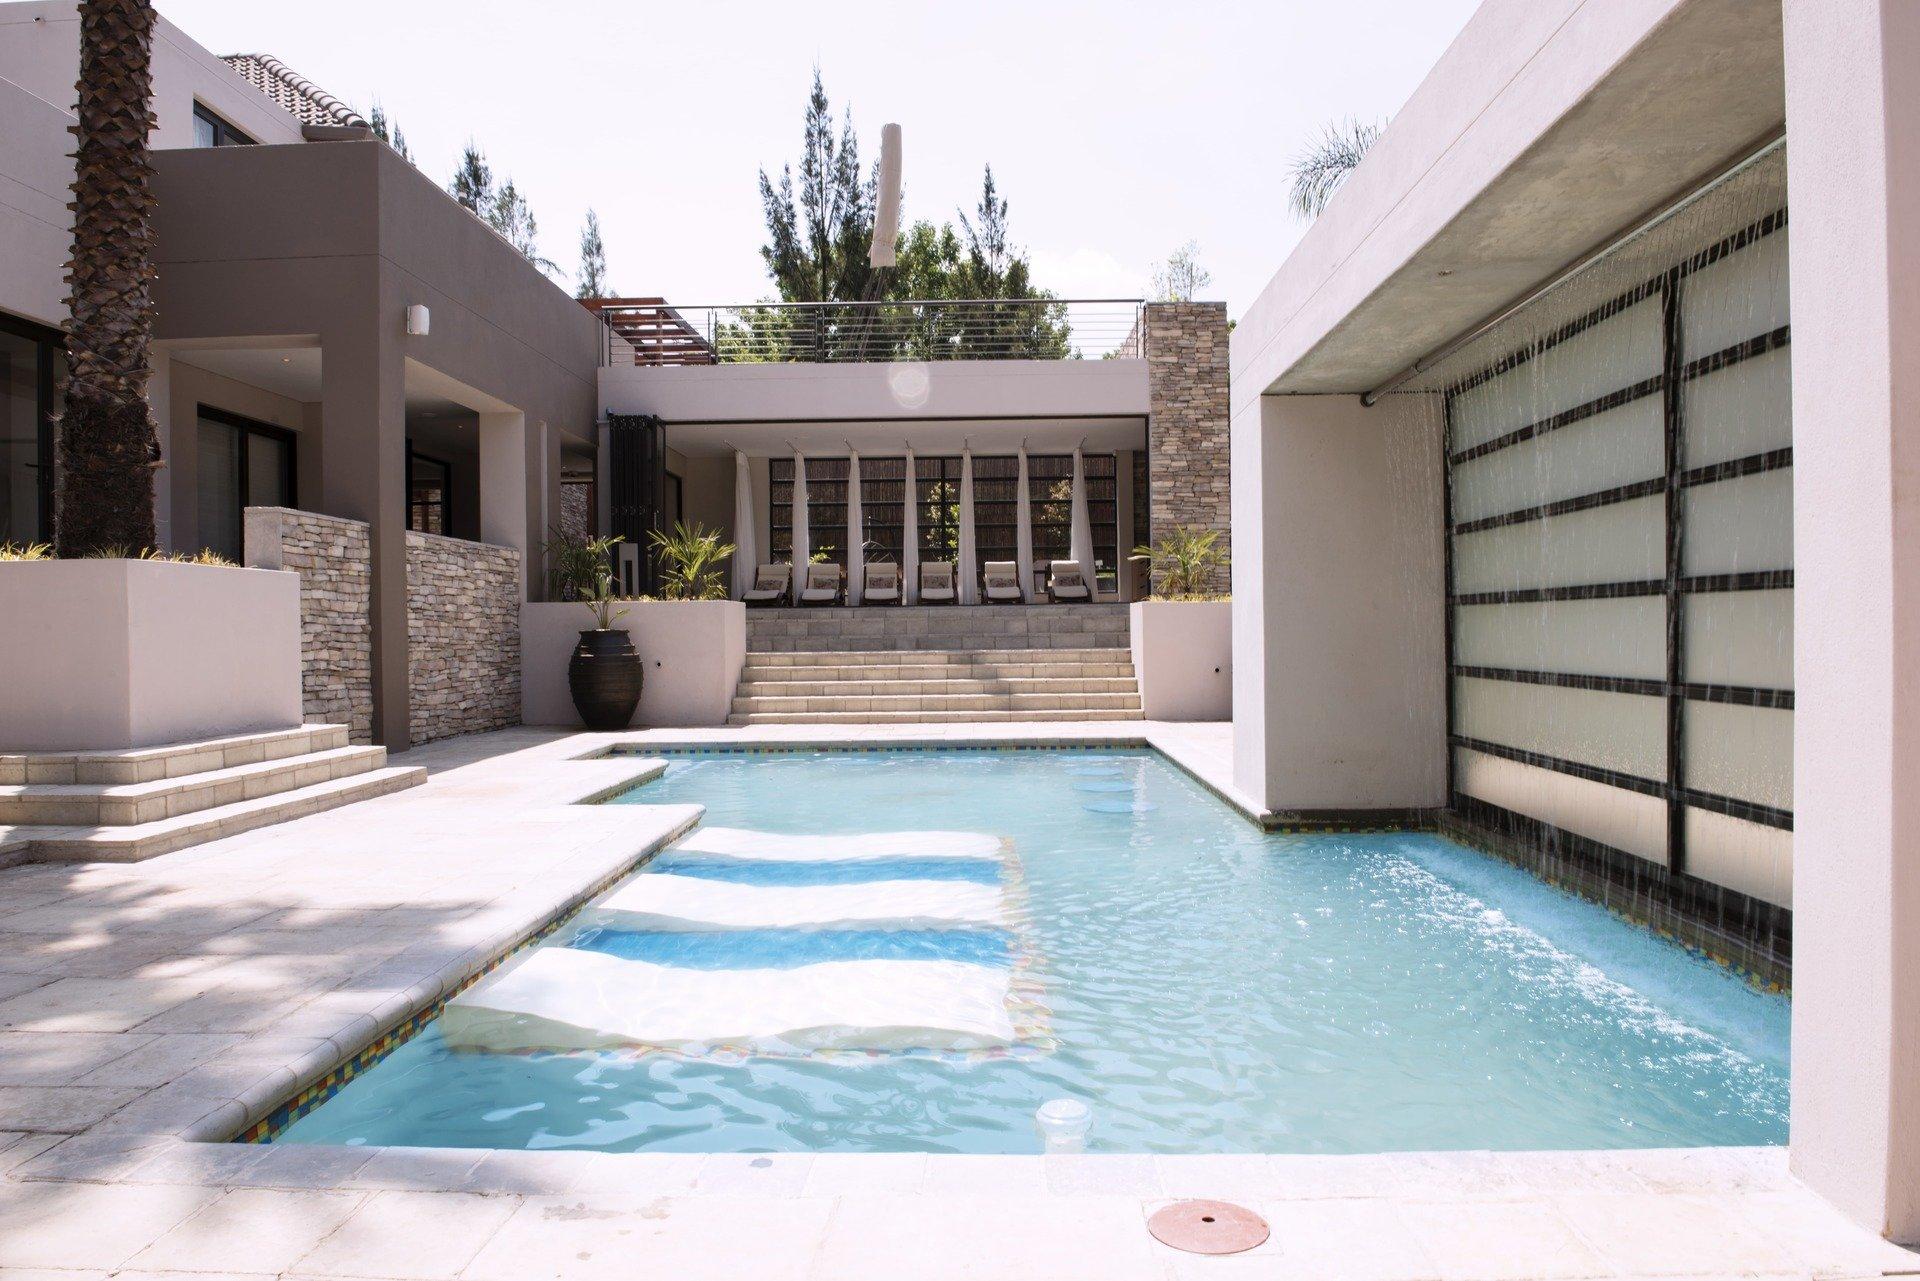 Aronia Day Spa Pool